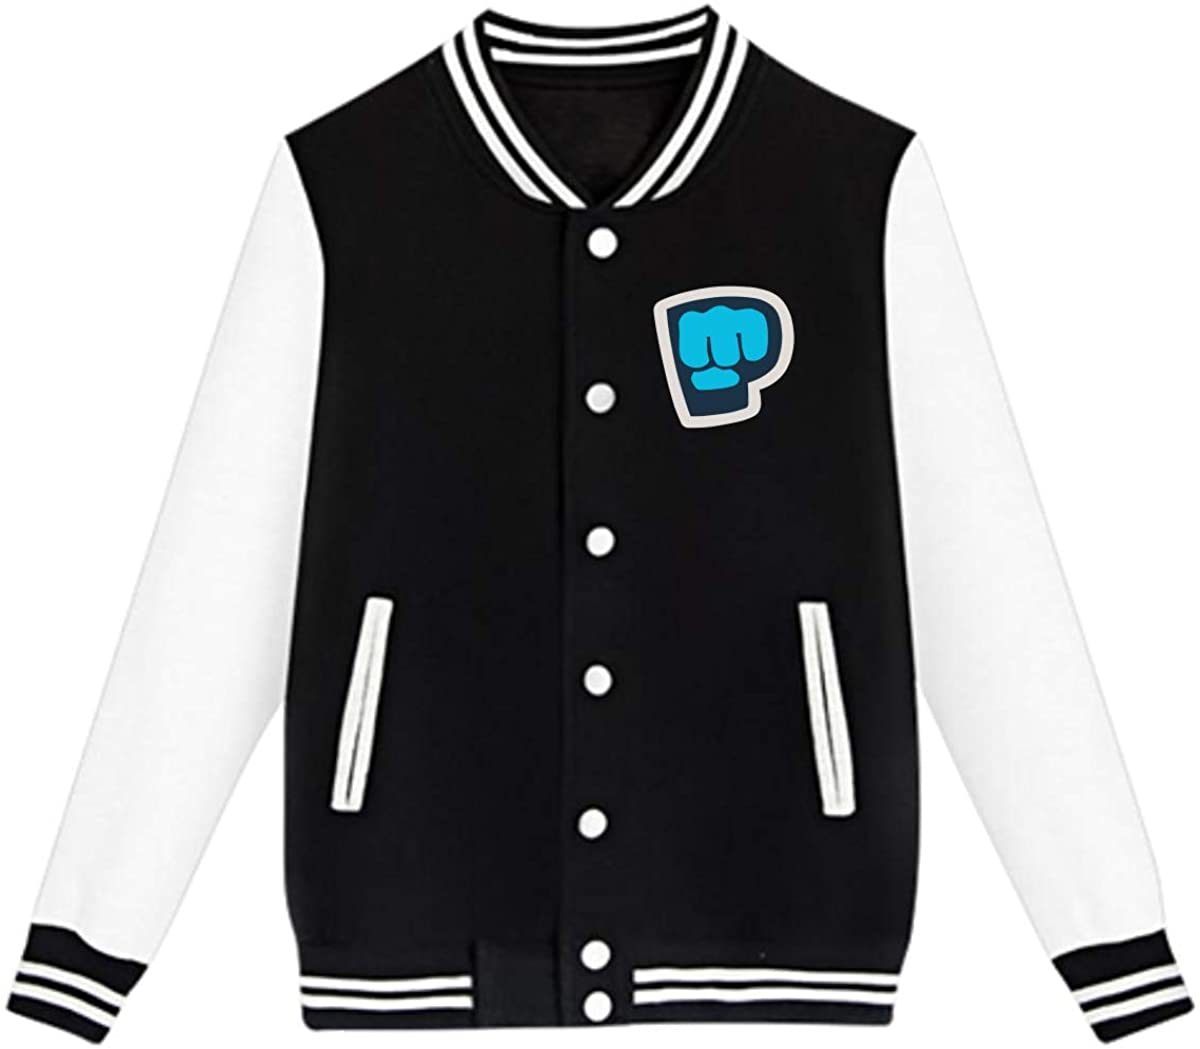 AHUAHUA Pewdiepie Unisex Youth Boys and Girls Sweatshirt Baseball Uniform Jacket Sport Coat